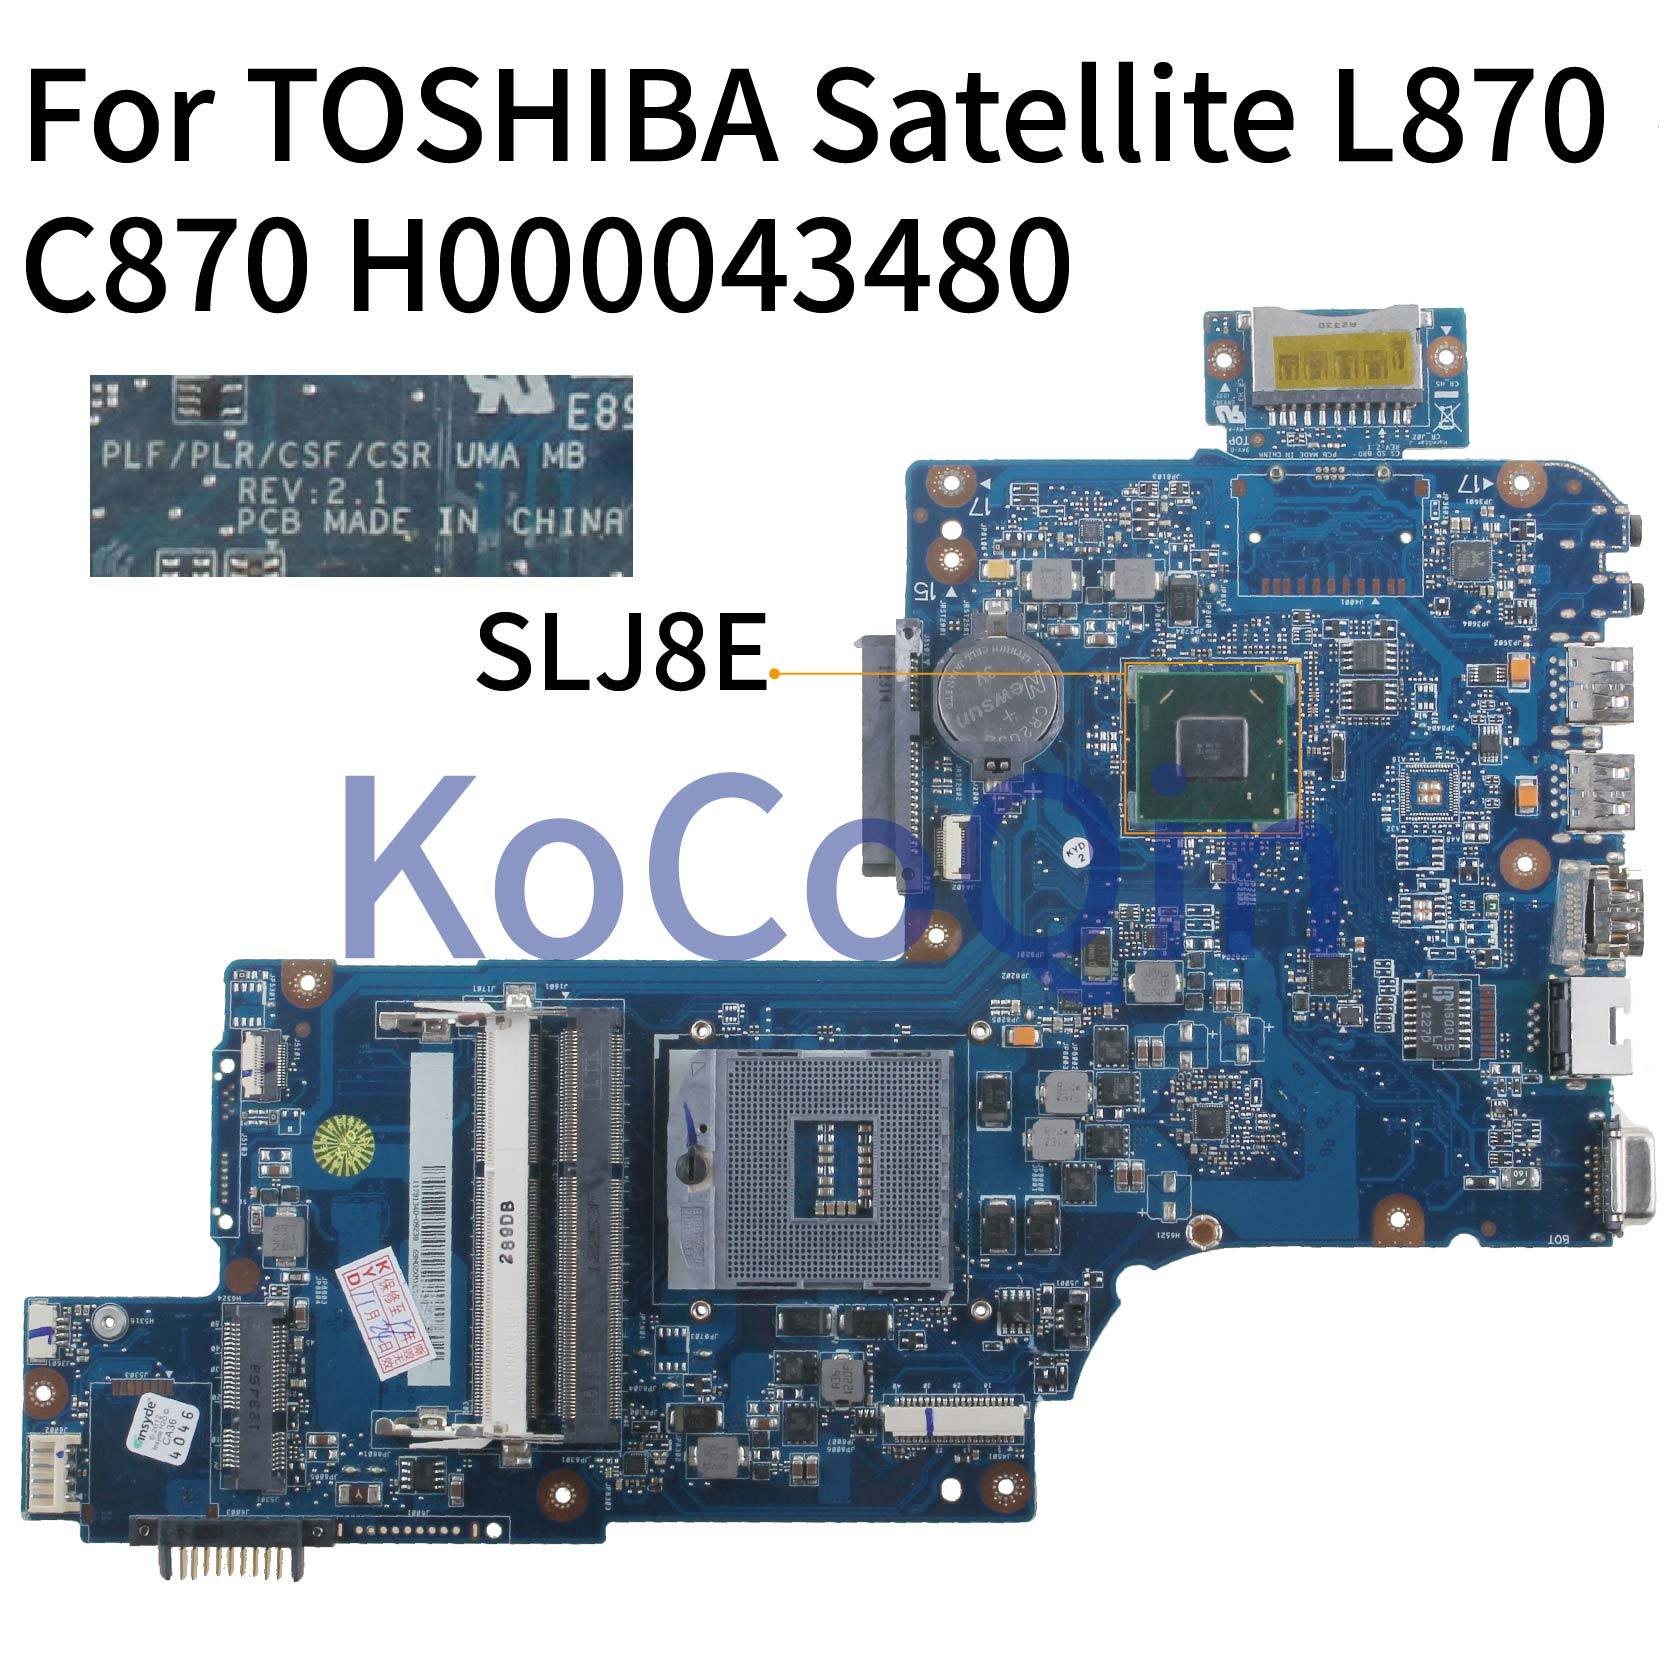 Laptop motherboard Para TOSHIBA Satellite C870 KoCoQin C875 L870 L875 S875 HM76 PLF/PLR/CSF/CSR Mainboard h000043480 SLJ8E